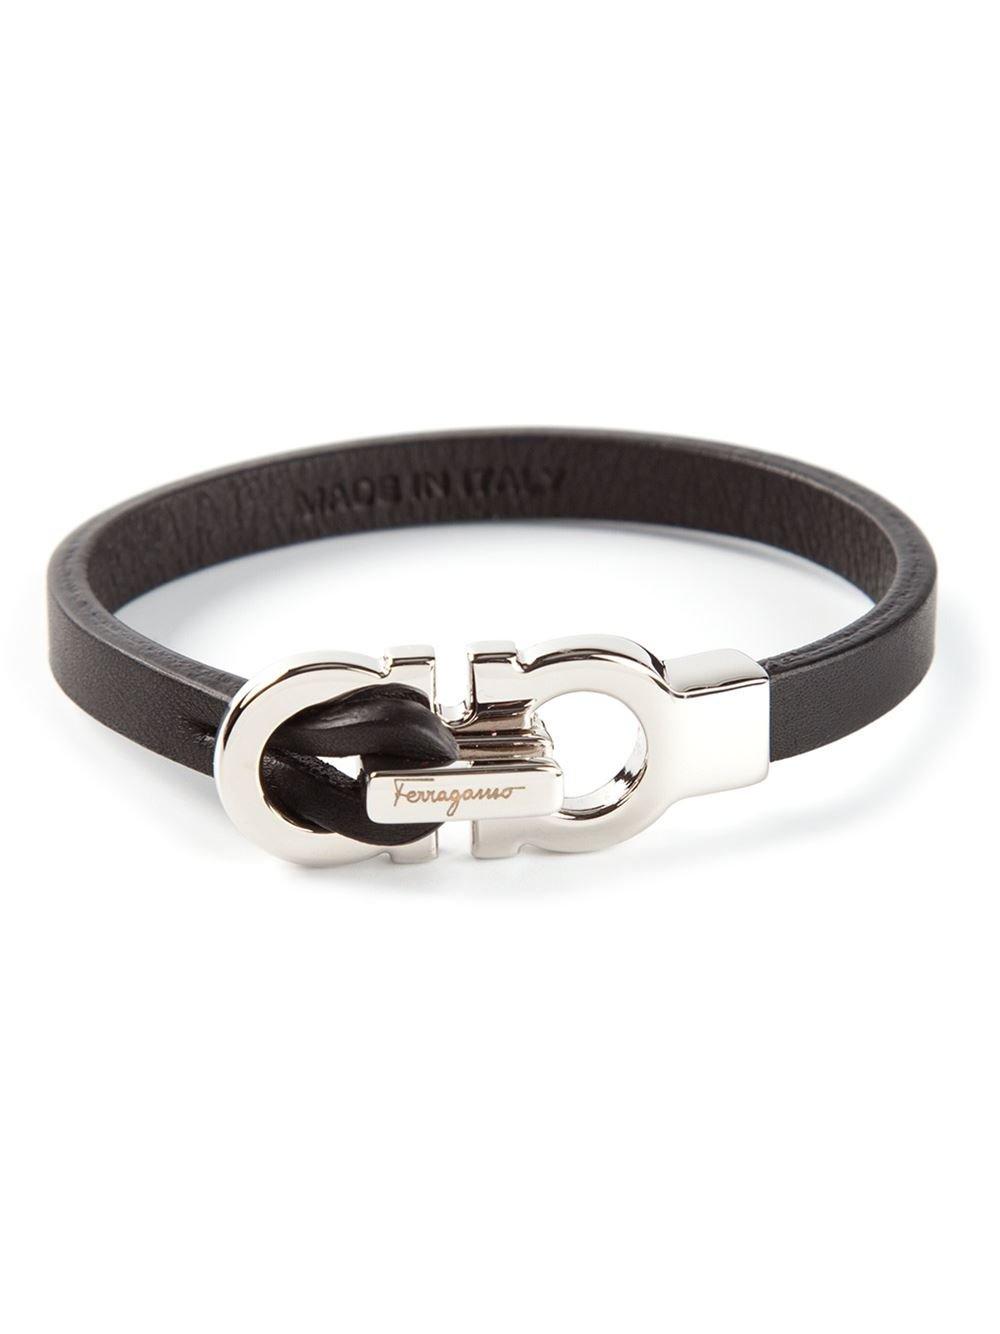 Ferragamo Gancini Bracelet in Black for Men - Lyst